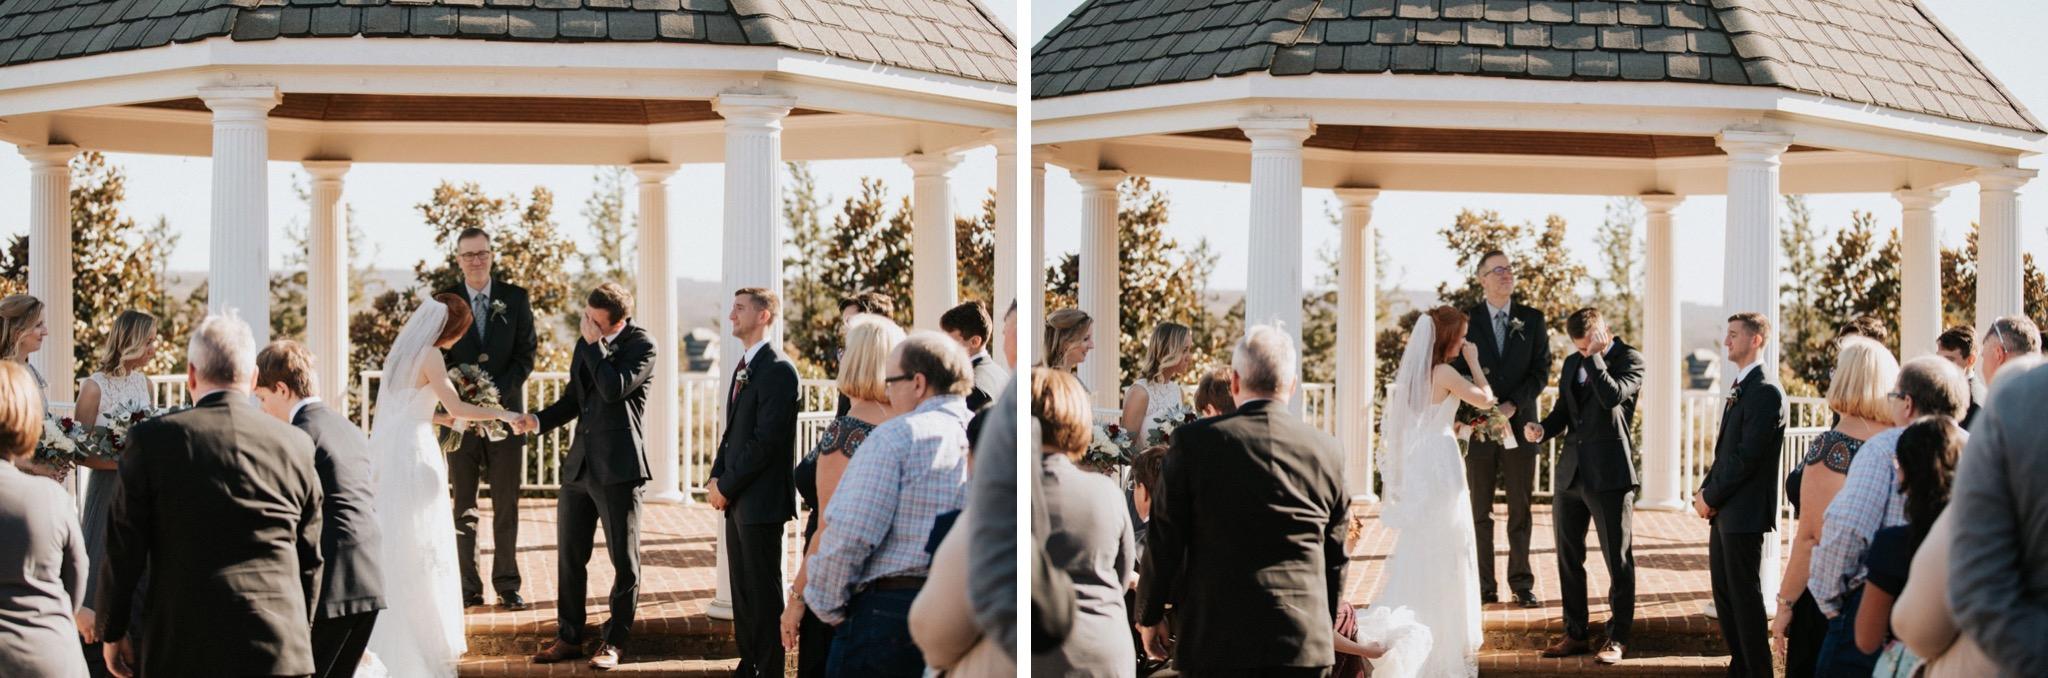 44_West Manor Estate Weddings - Pat Cori Photography-94_West Manor Estate Weddings - Pat Cori Photography-95_Ceremony_PatCoriPhotography_VirginiaWeddingPhotographer_WestManorEstate_Wedding.jpg